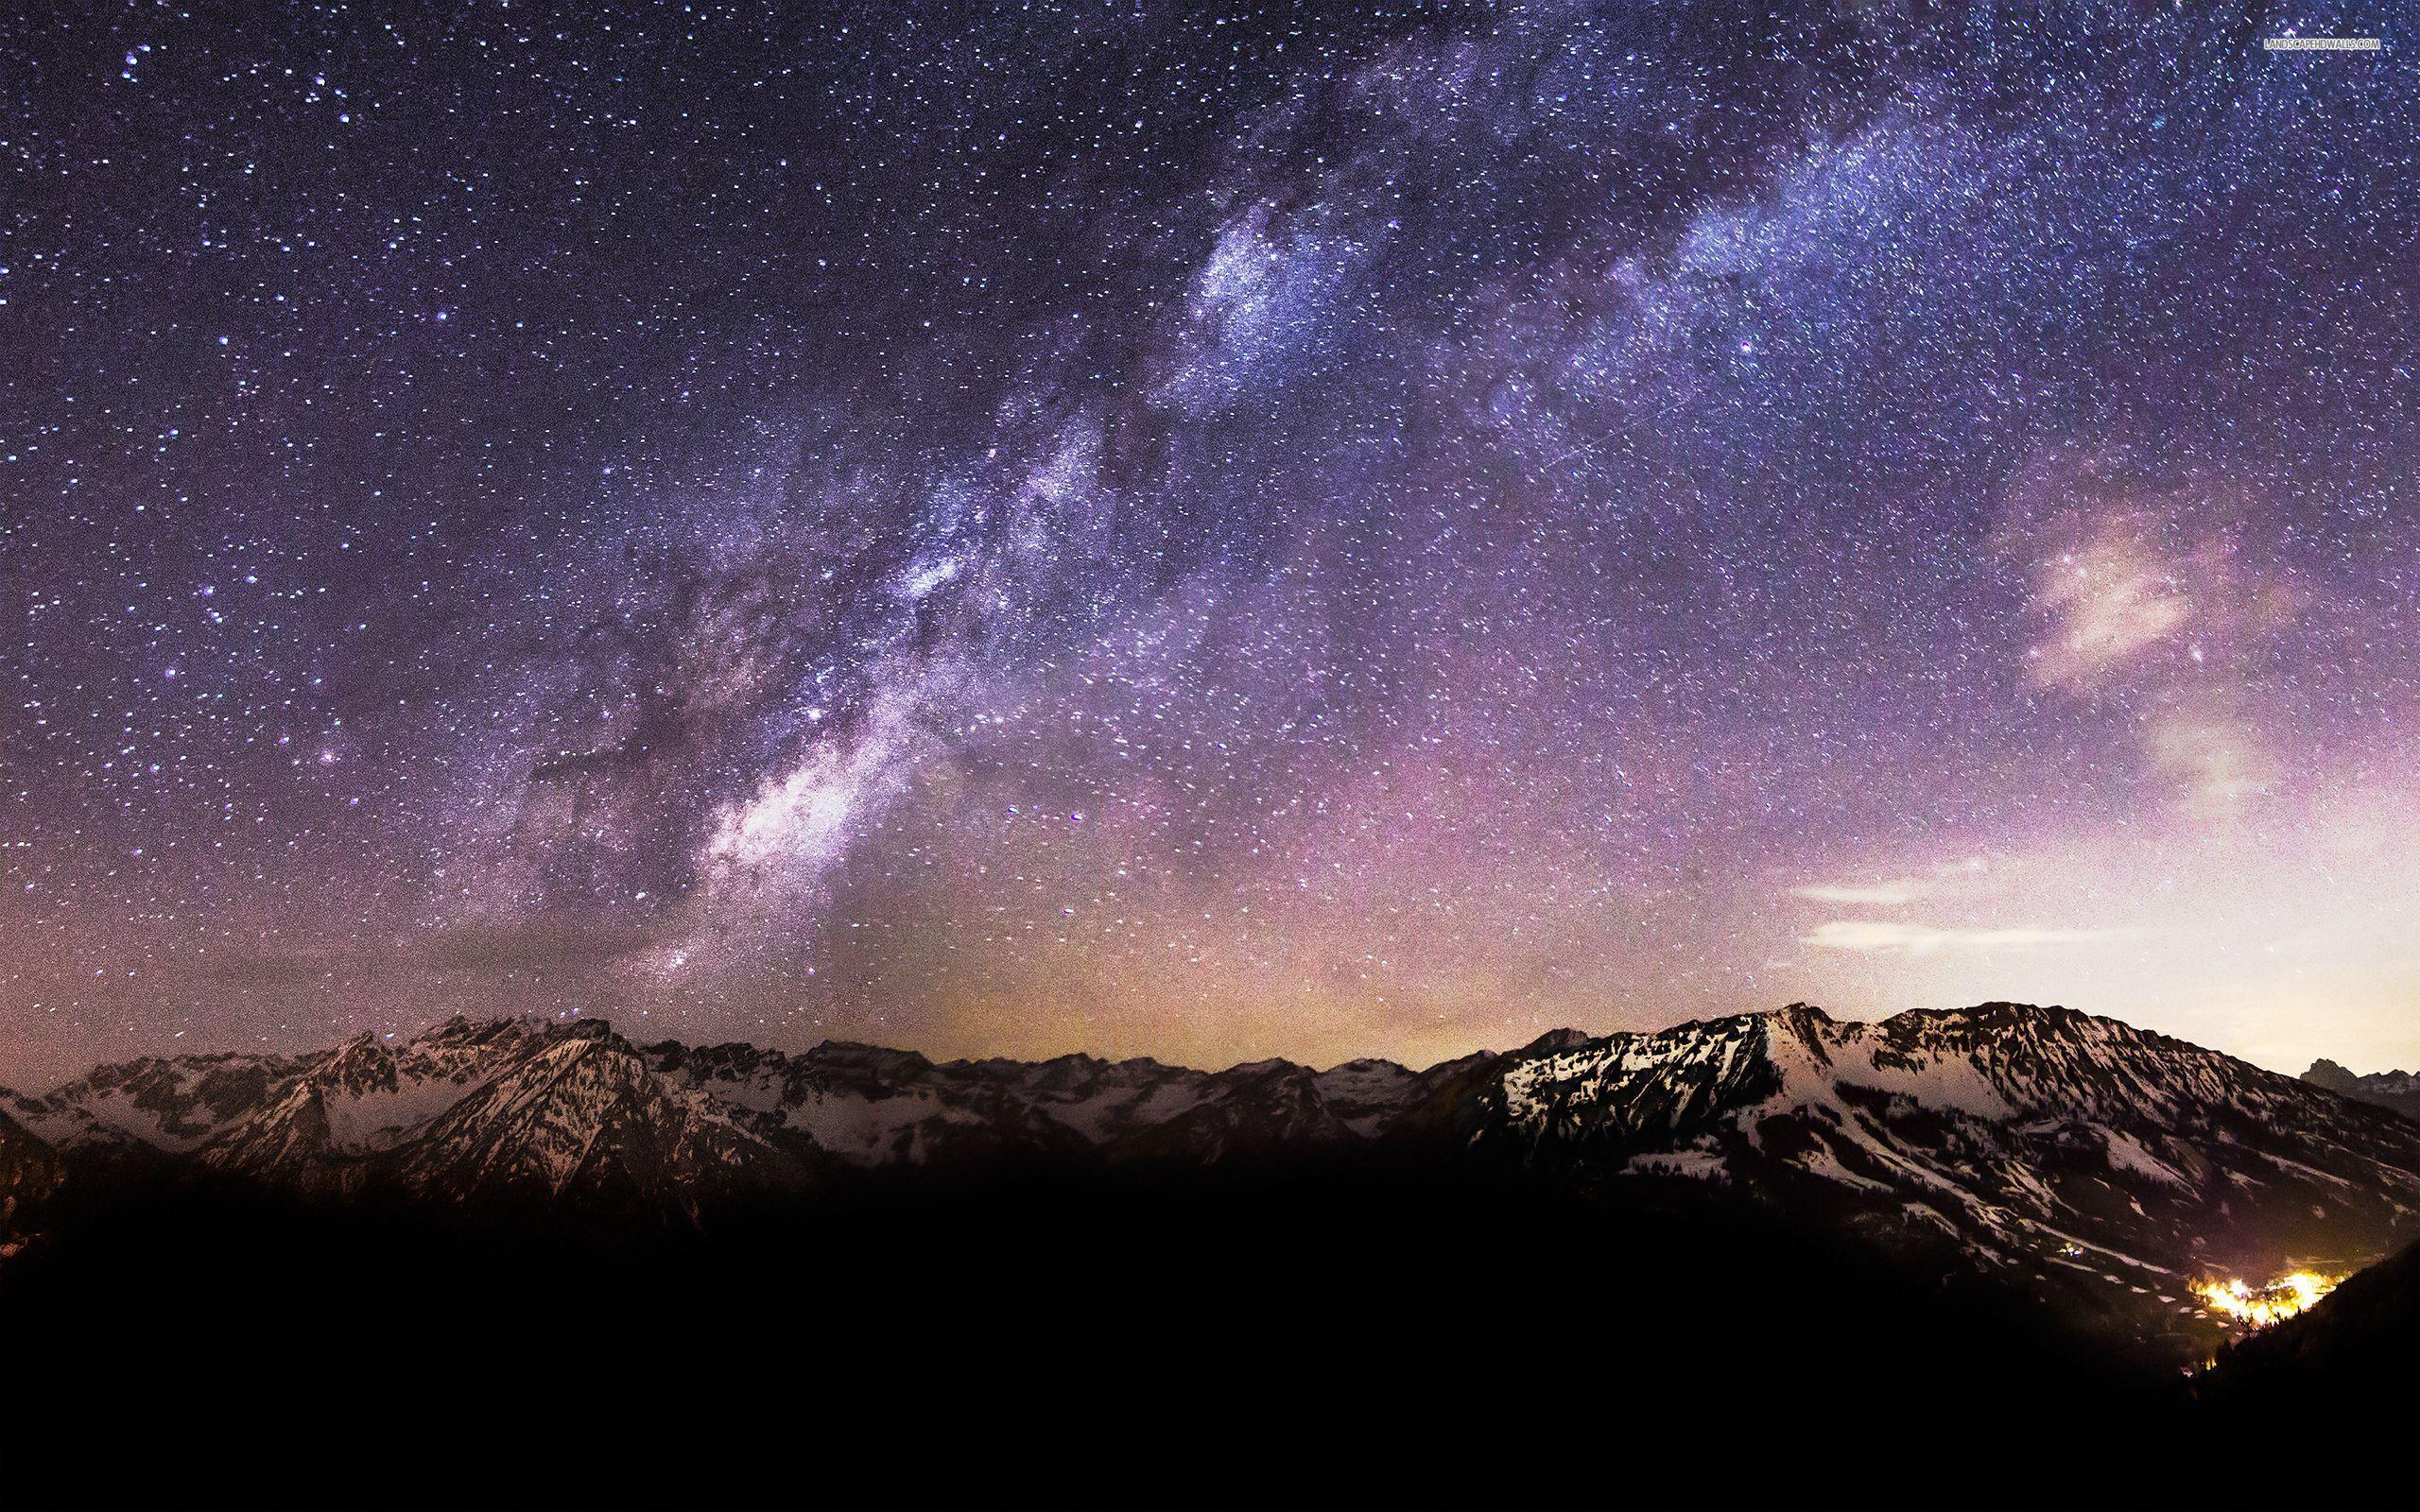 Amazing Milky Way Wallpapers: K Ultra HD Milky Way Wallpapers HD Desktop Backgrounds X